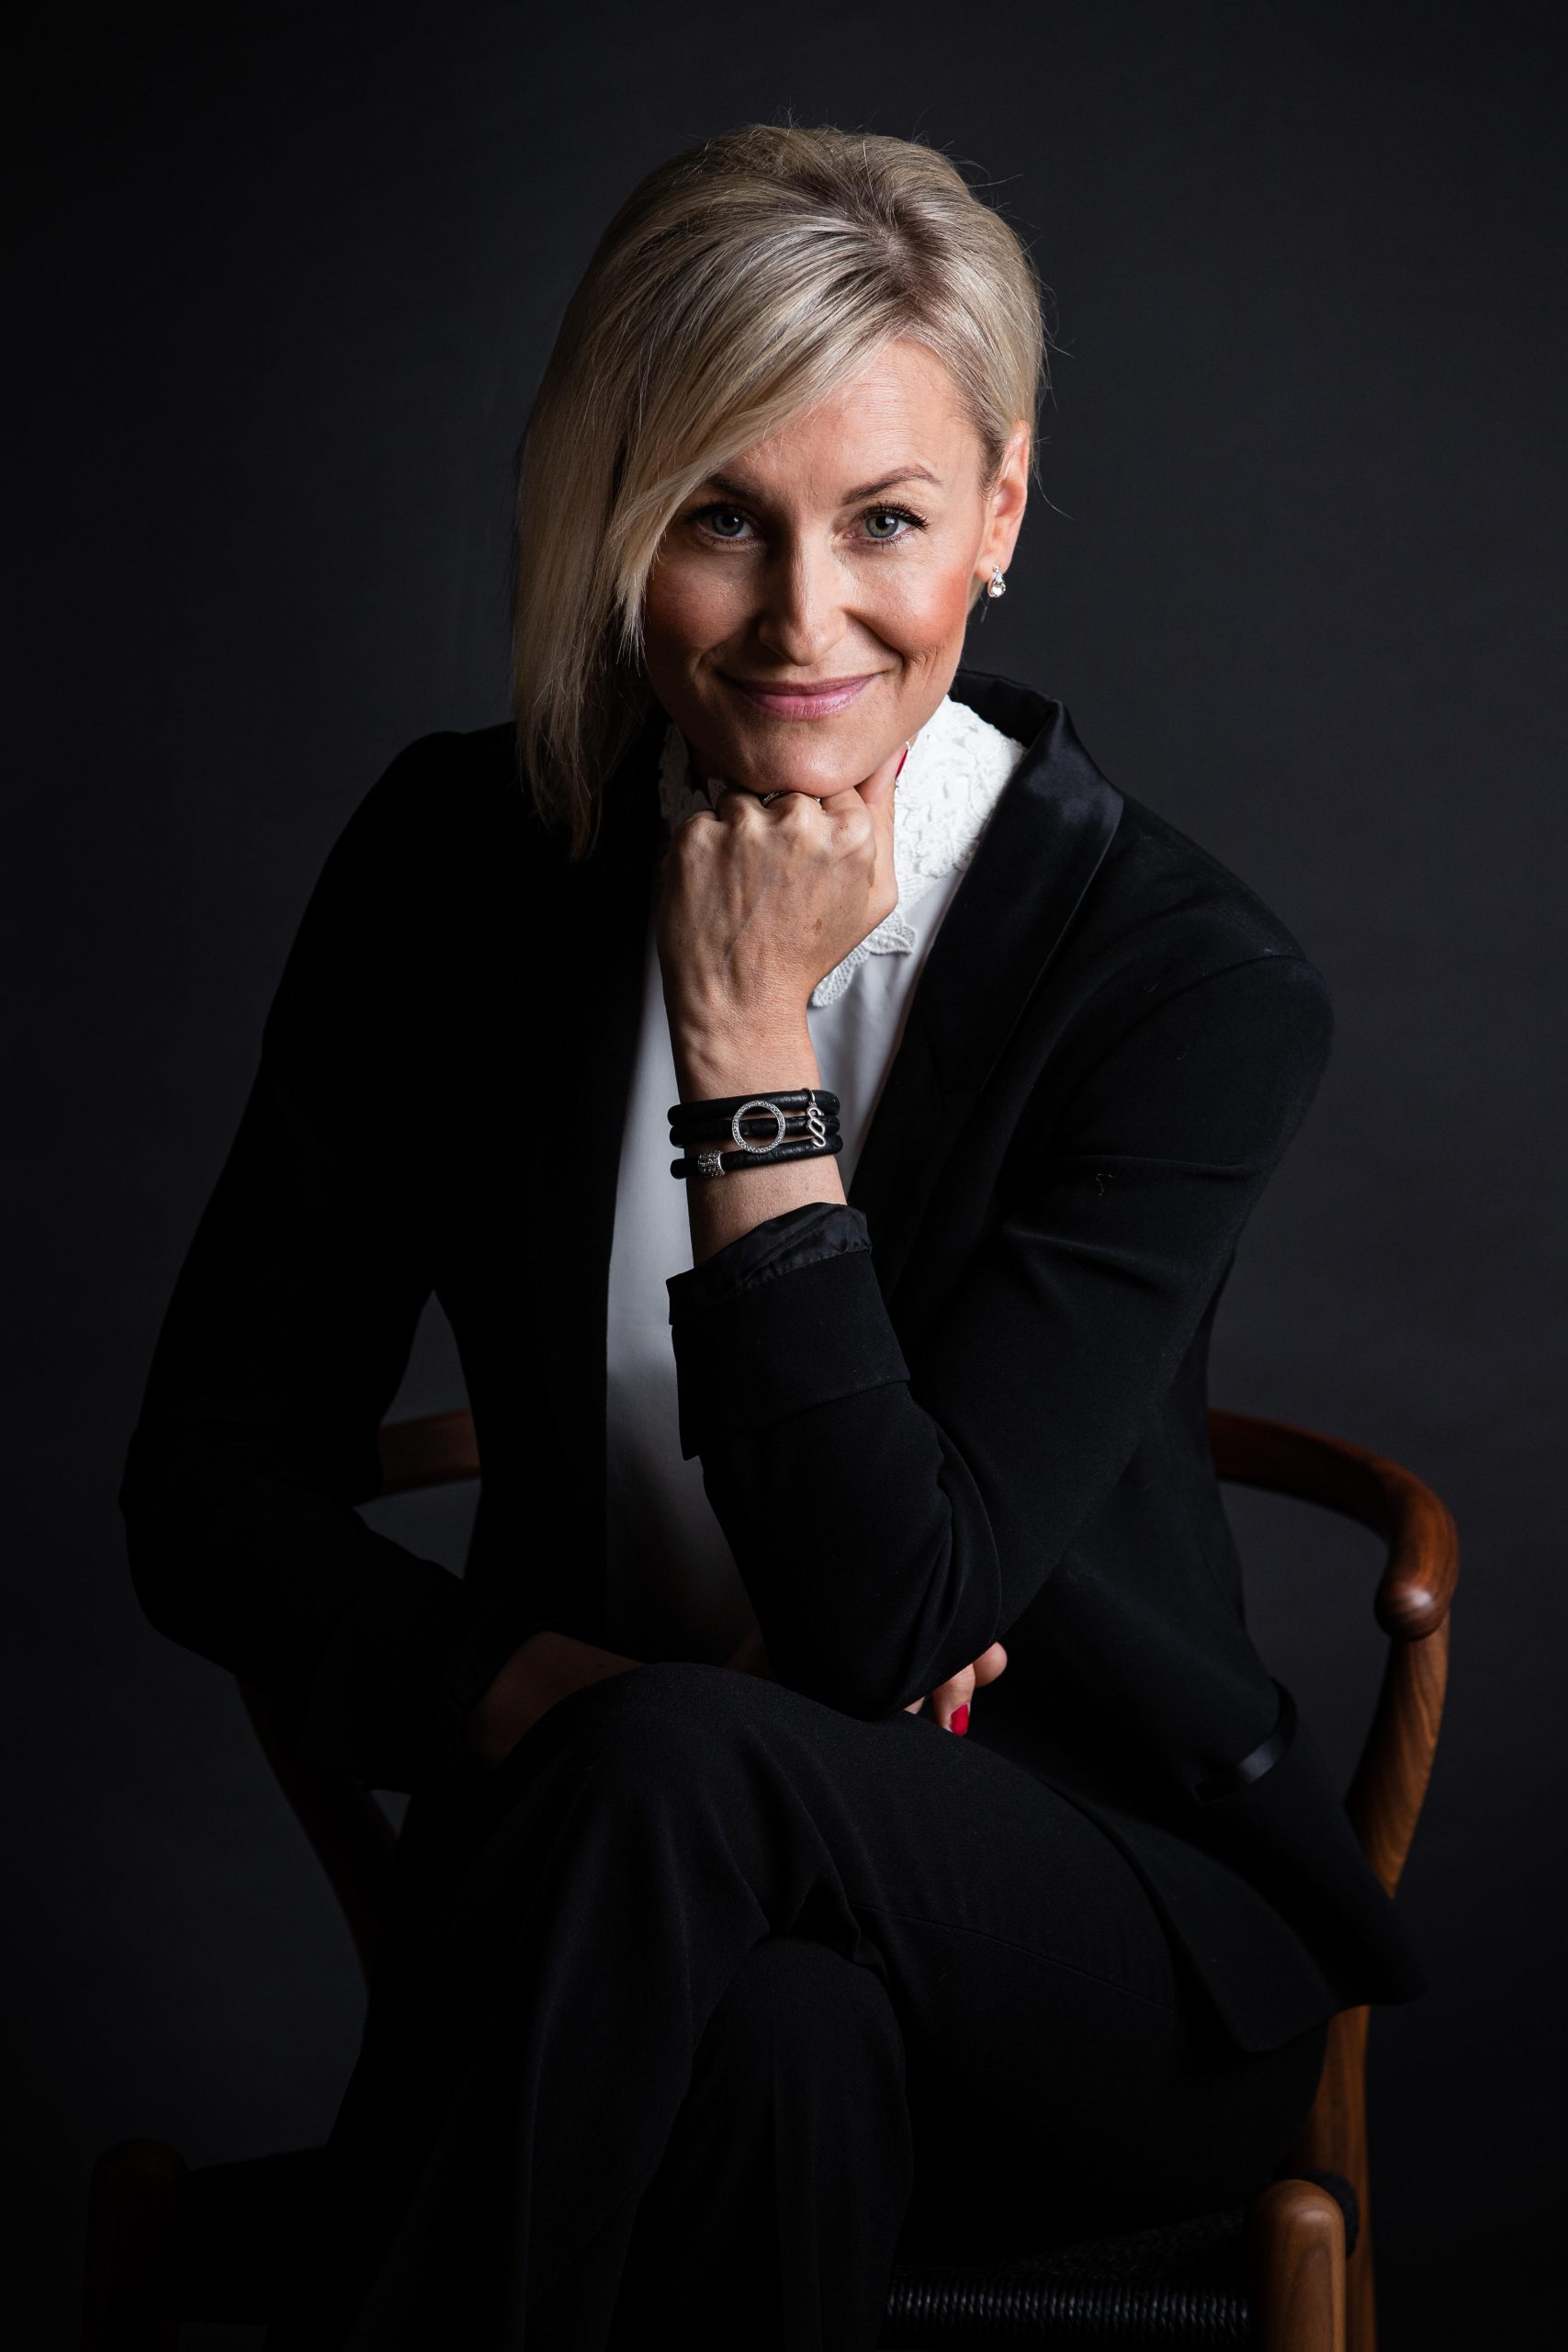 Hanna Larsson Rampe